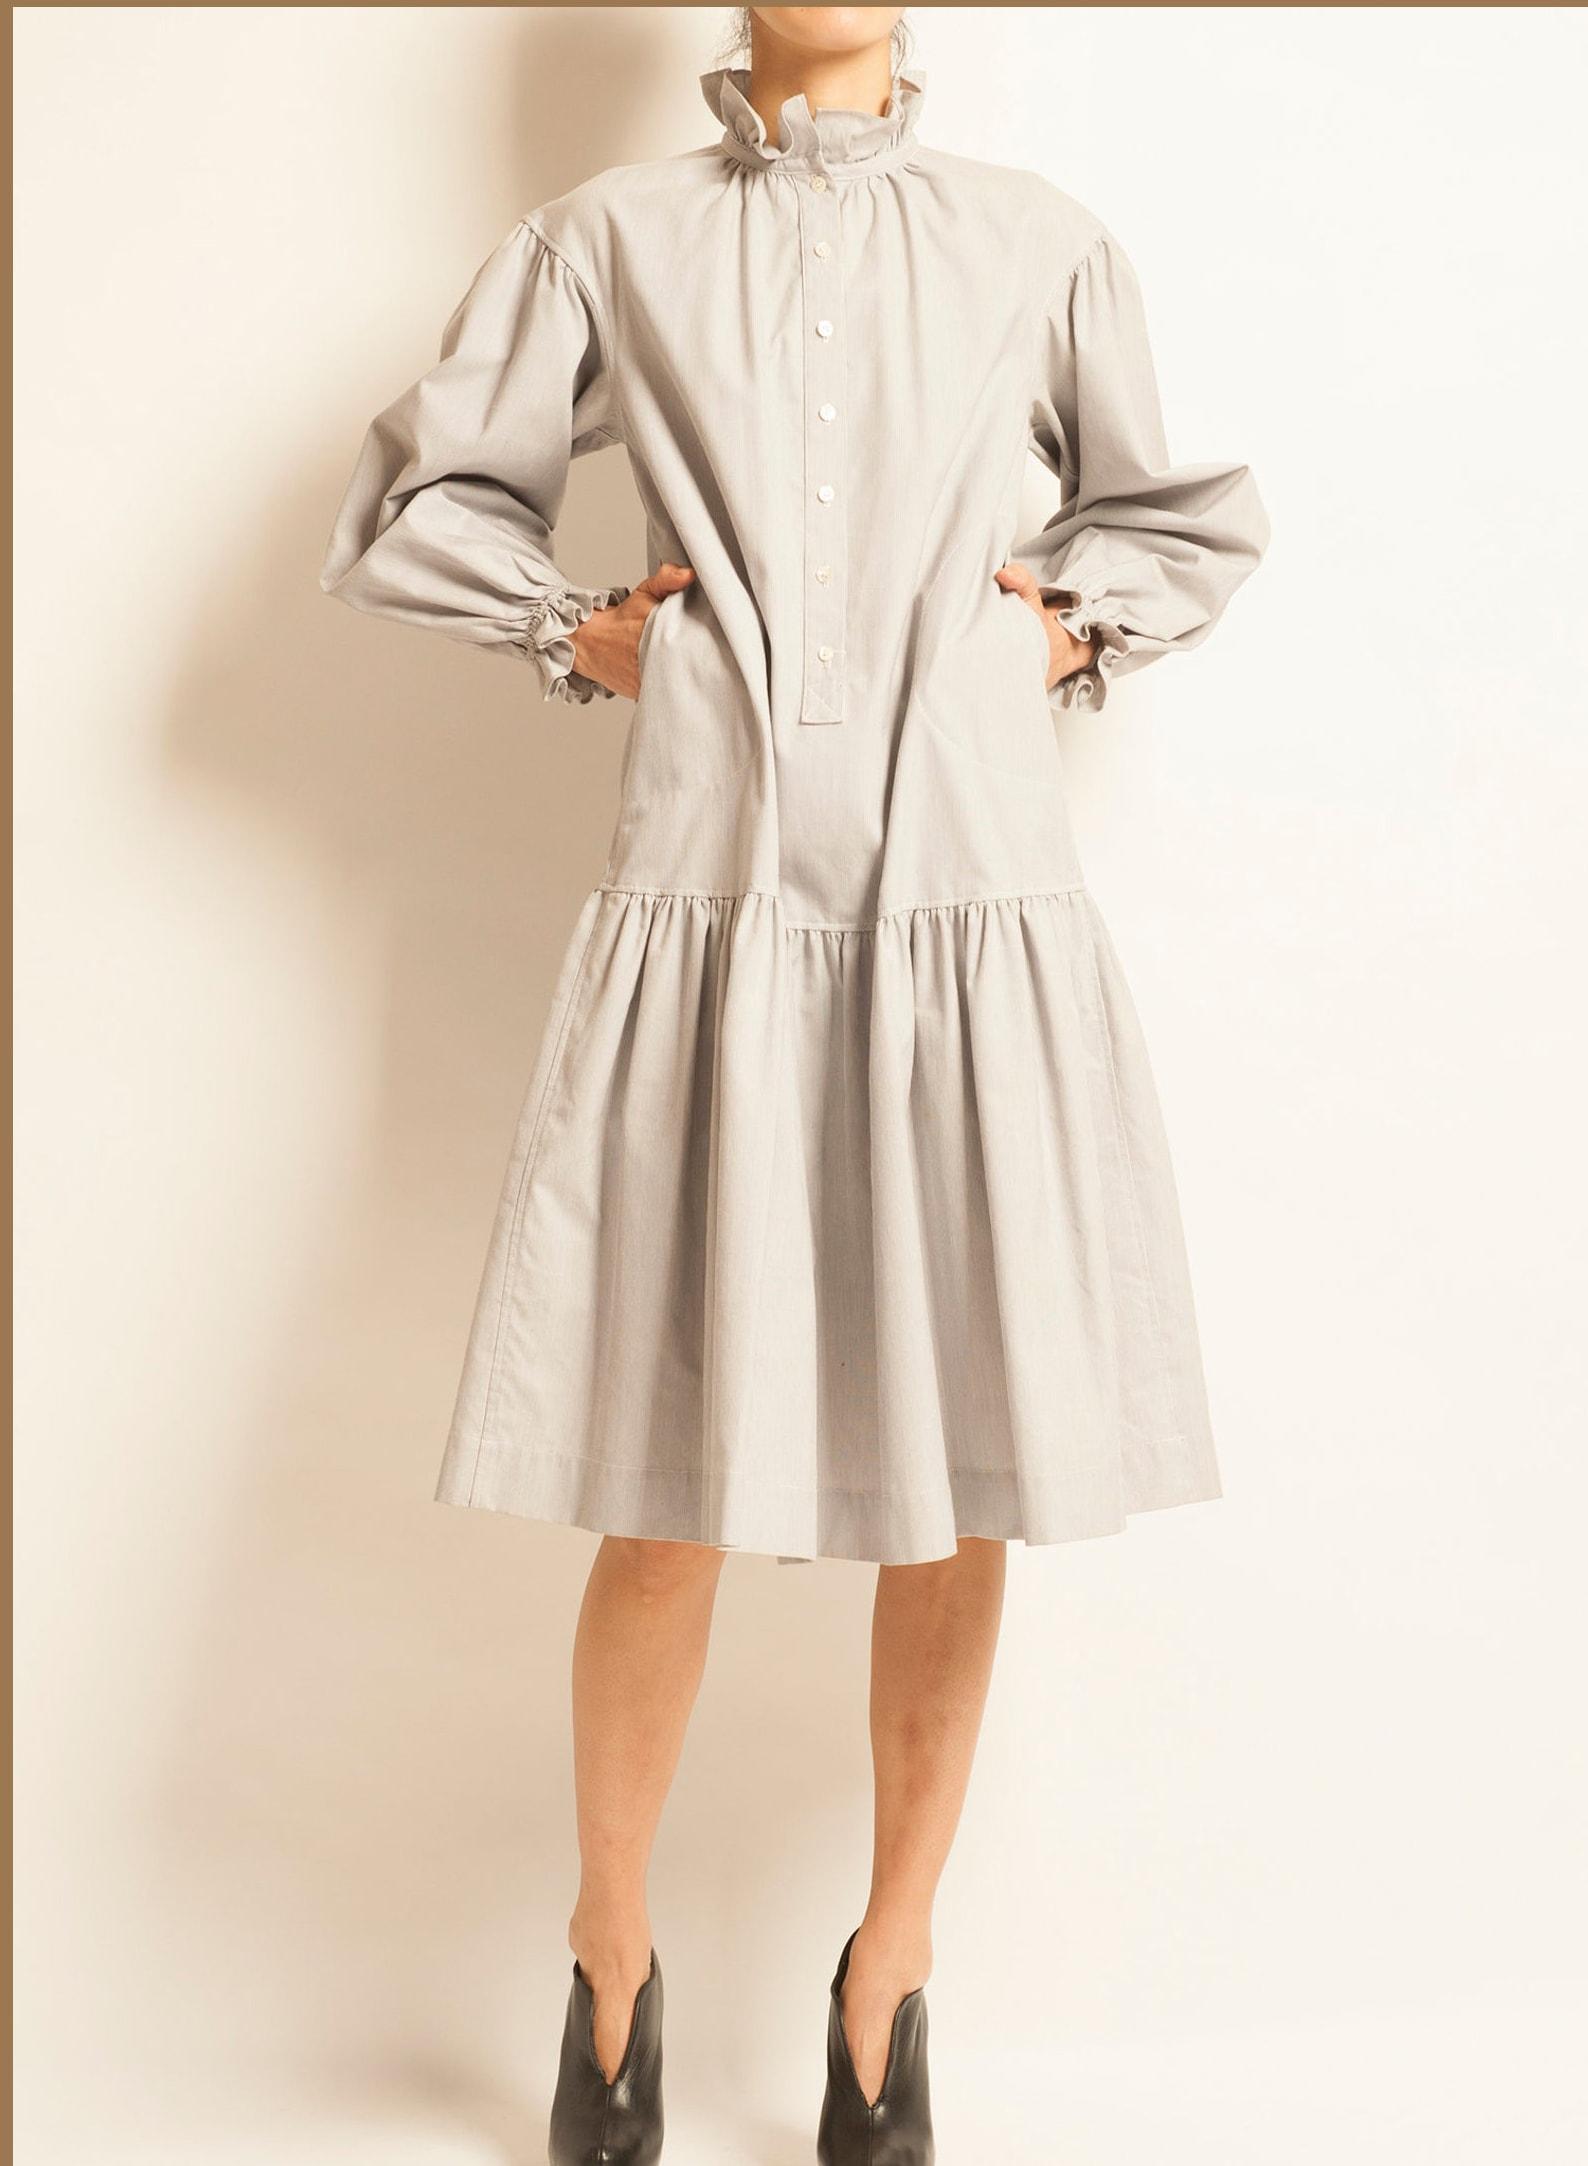 Day dress Yves Saint Laurent from 1977